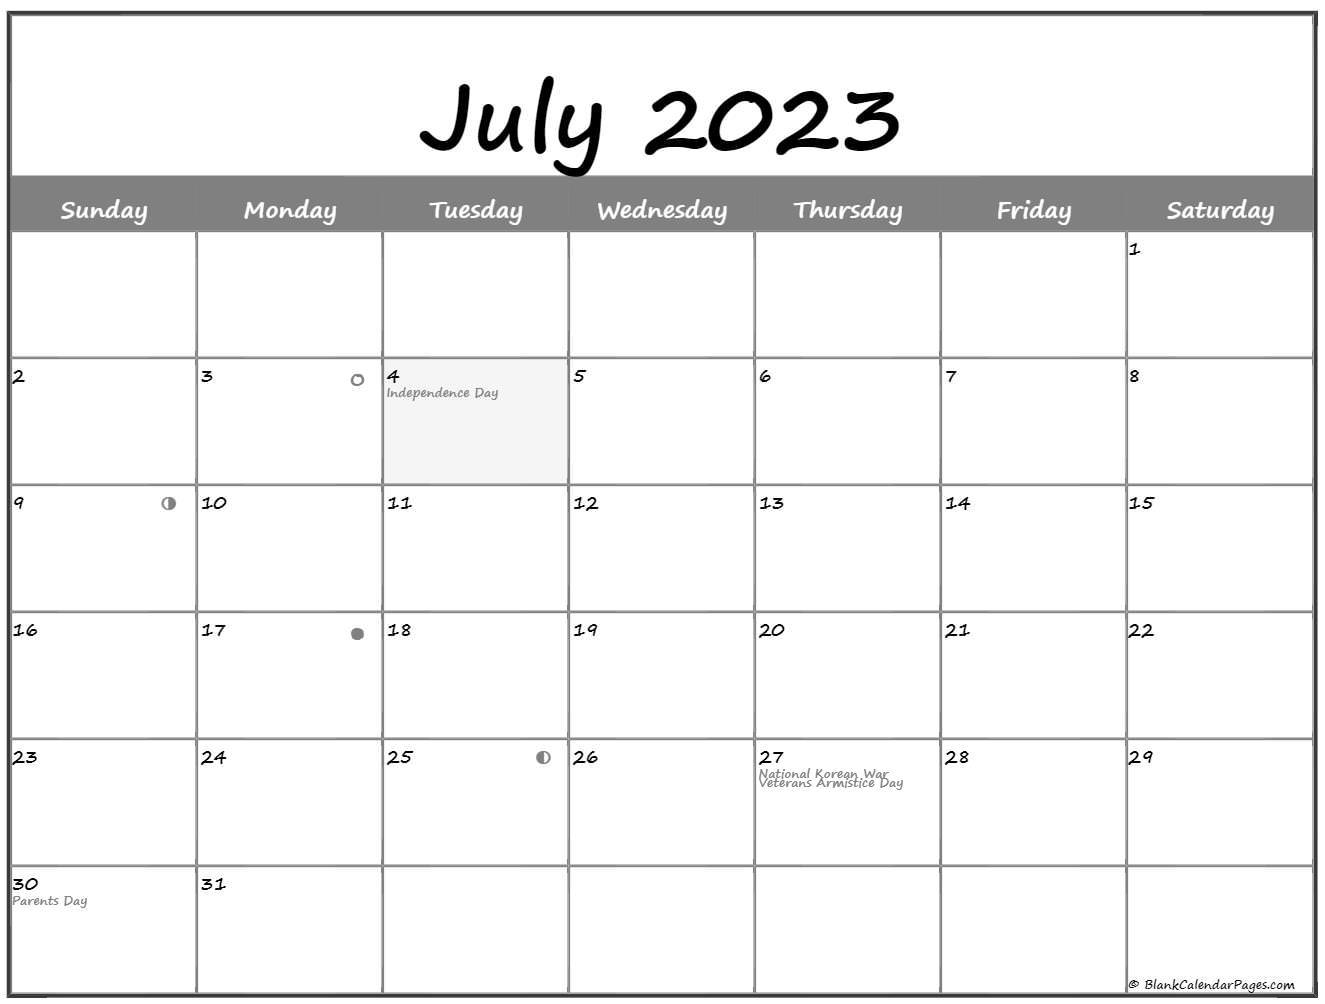 July 2022 Lunar Calendar | Moon Phase Calendar